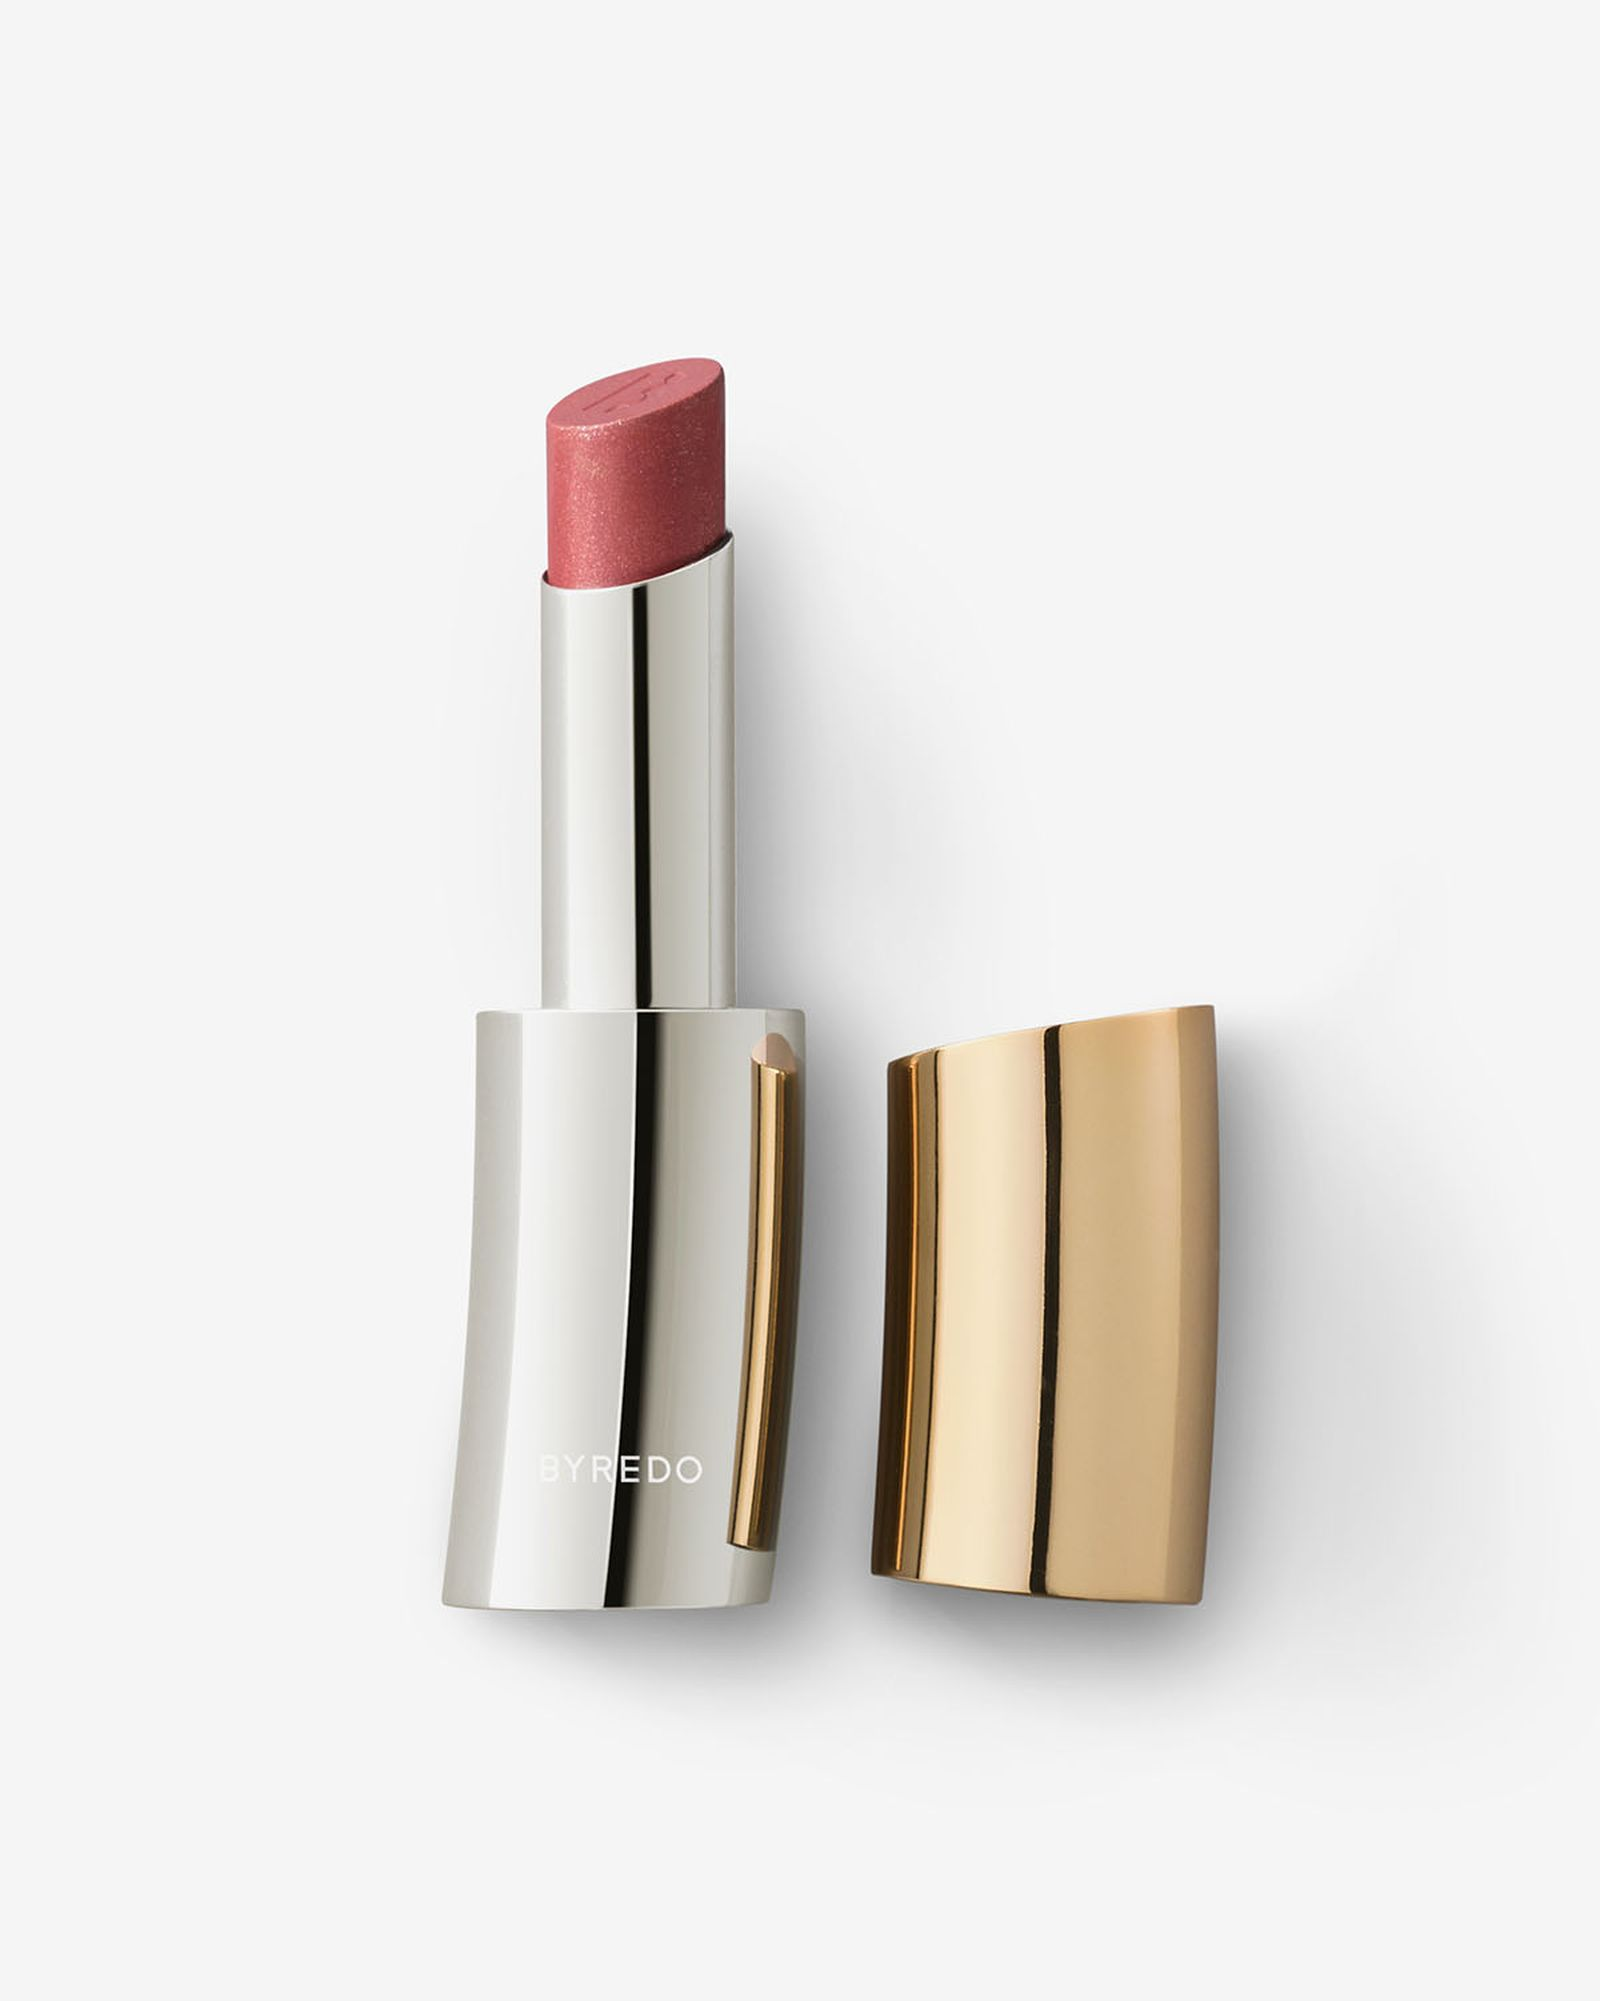 byredo-shimmering-nudes-lipstick-03